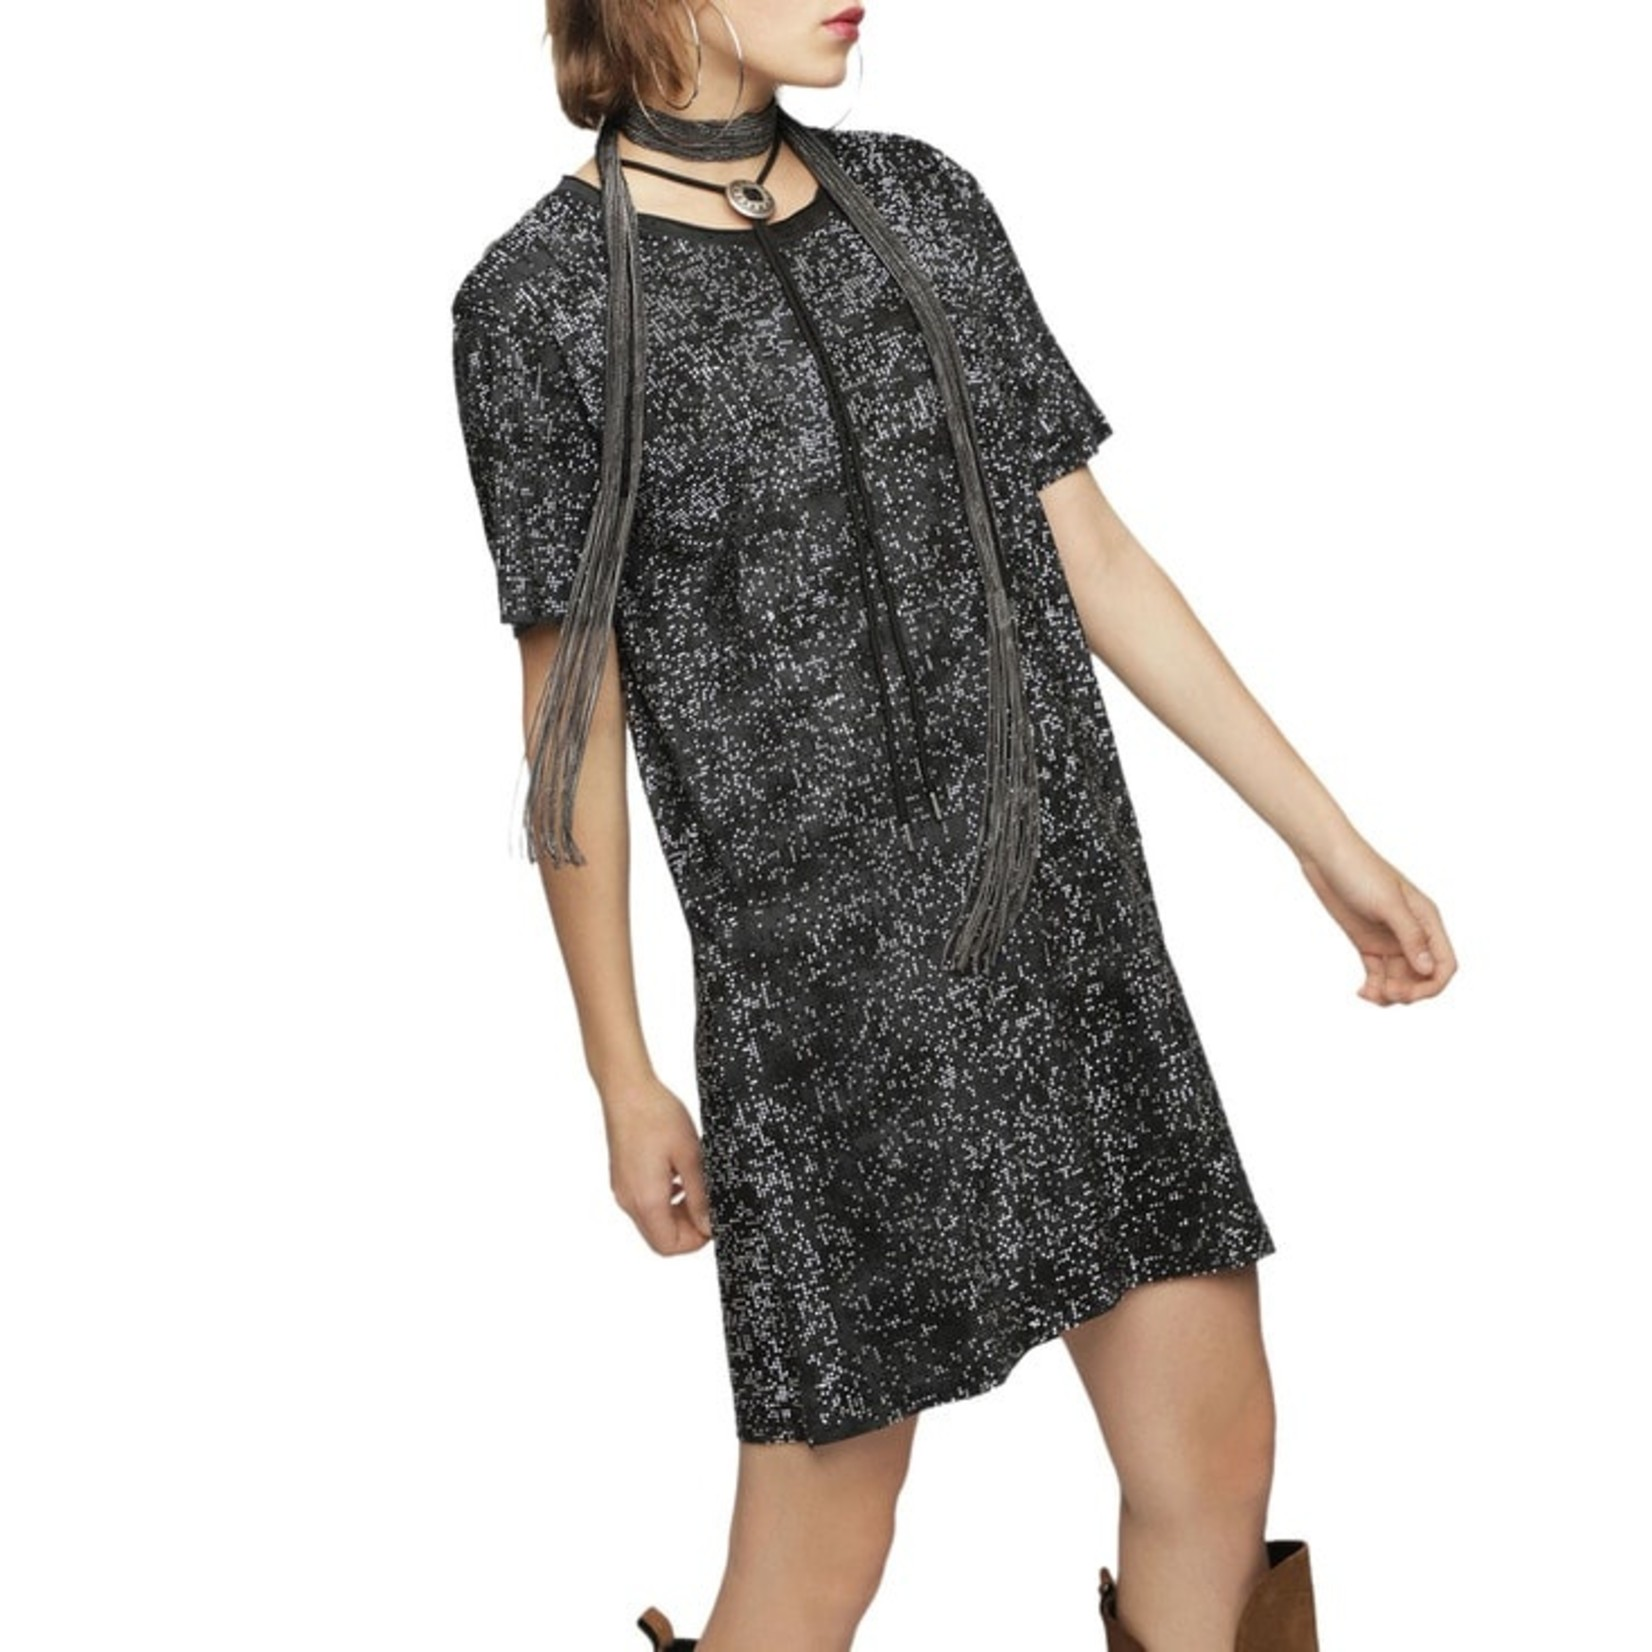 DIESEL DIESEL DRESS ARY - BLACK/STRASS